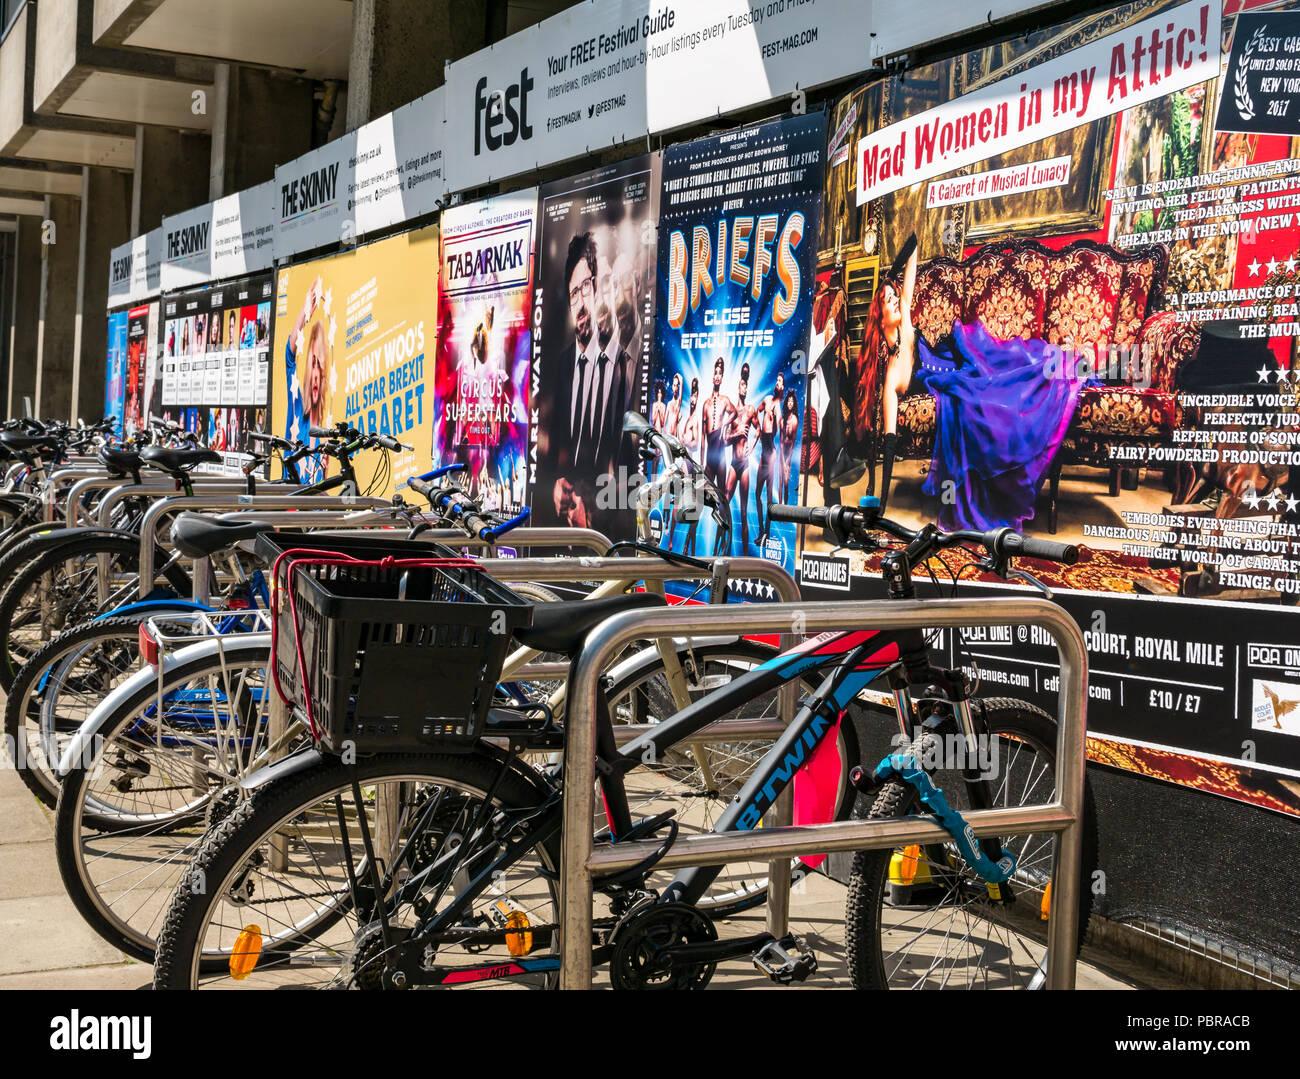 Estacionar bicicletas alineadas en bike park con el festival Fringe de  Edimburgo carteles 4d9d1115c7077